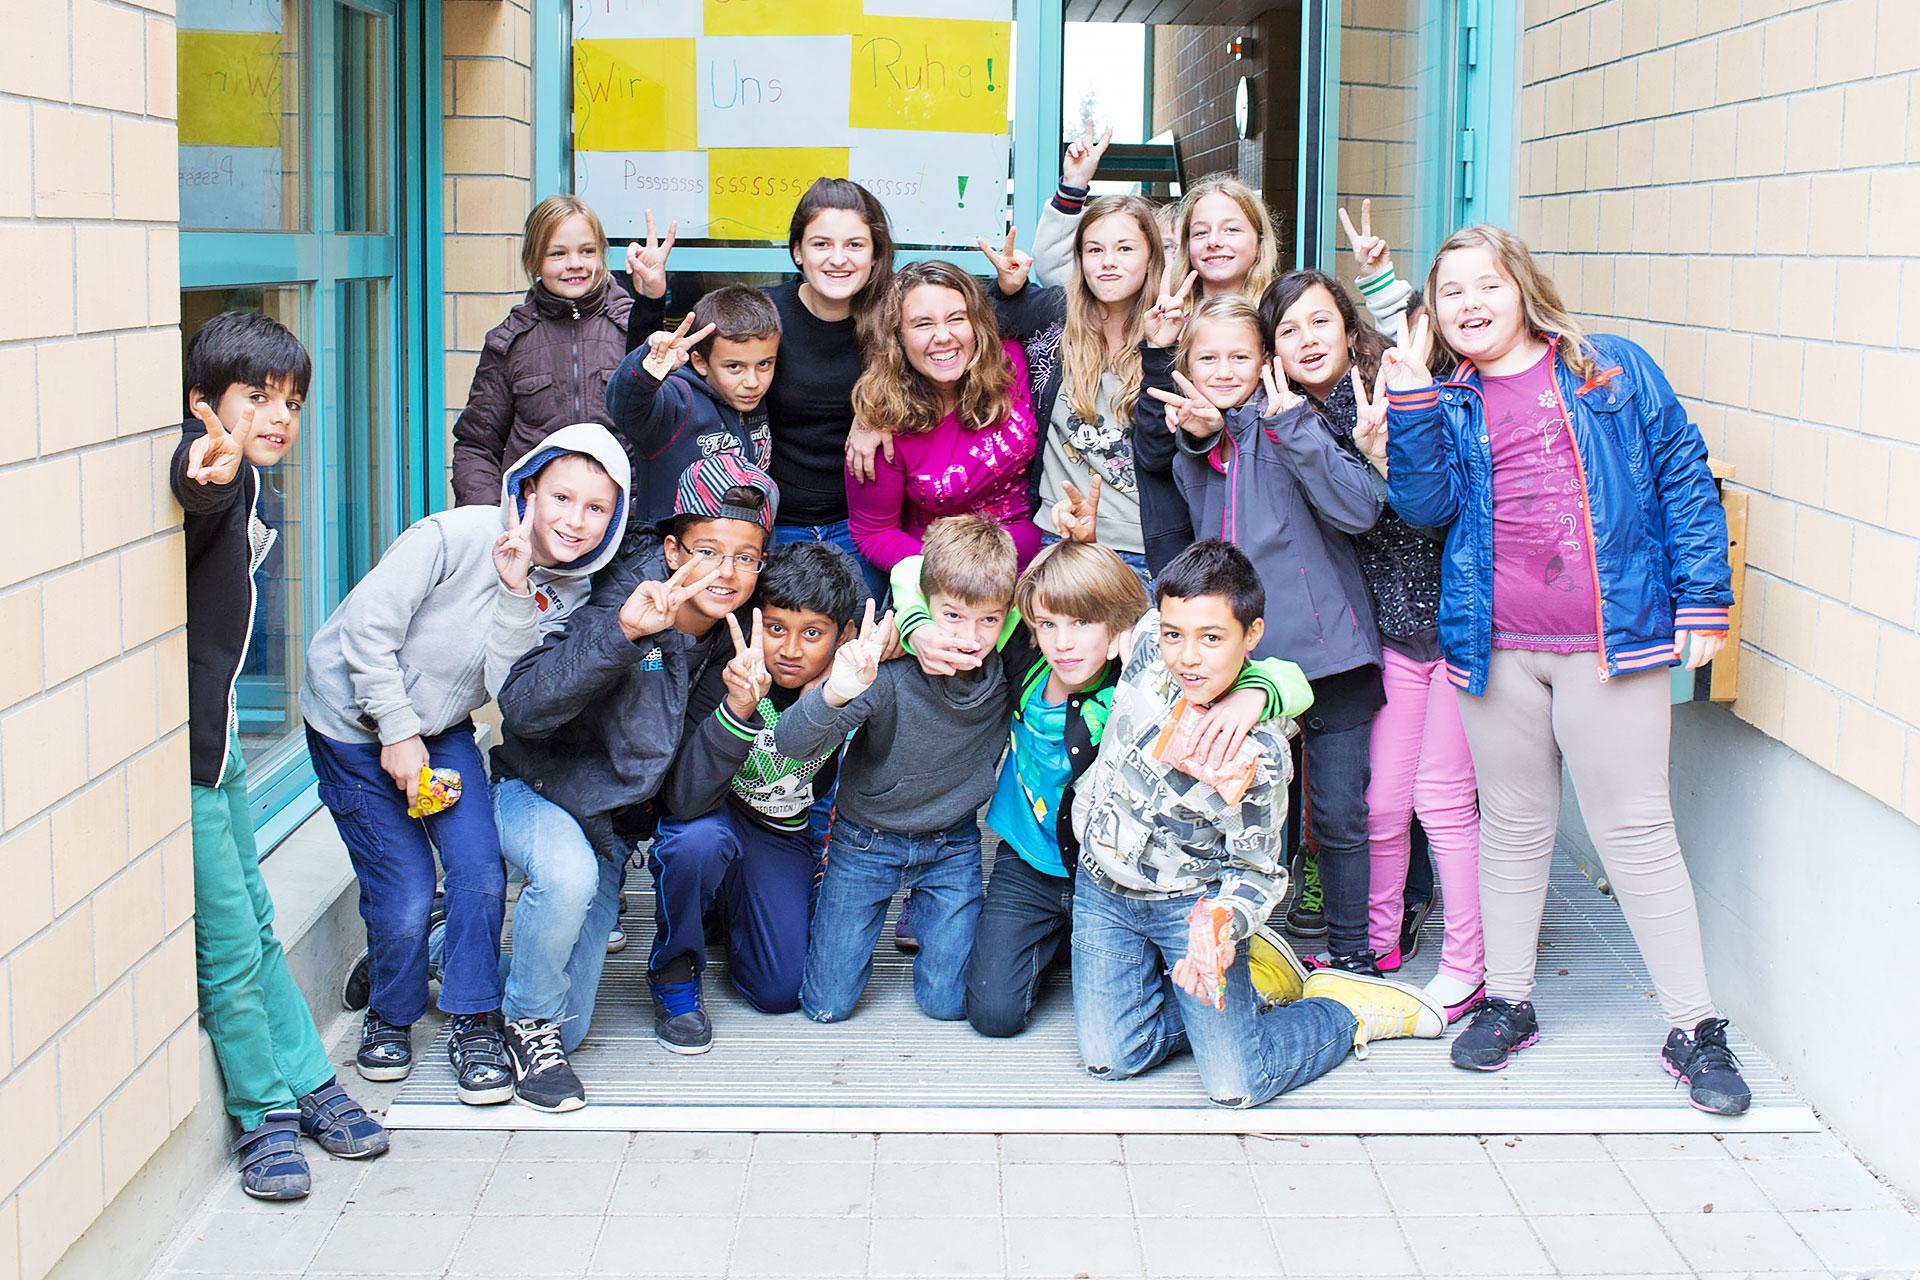 Klassenfoto vor dem Schuleingang